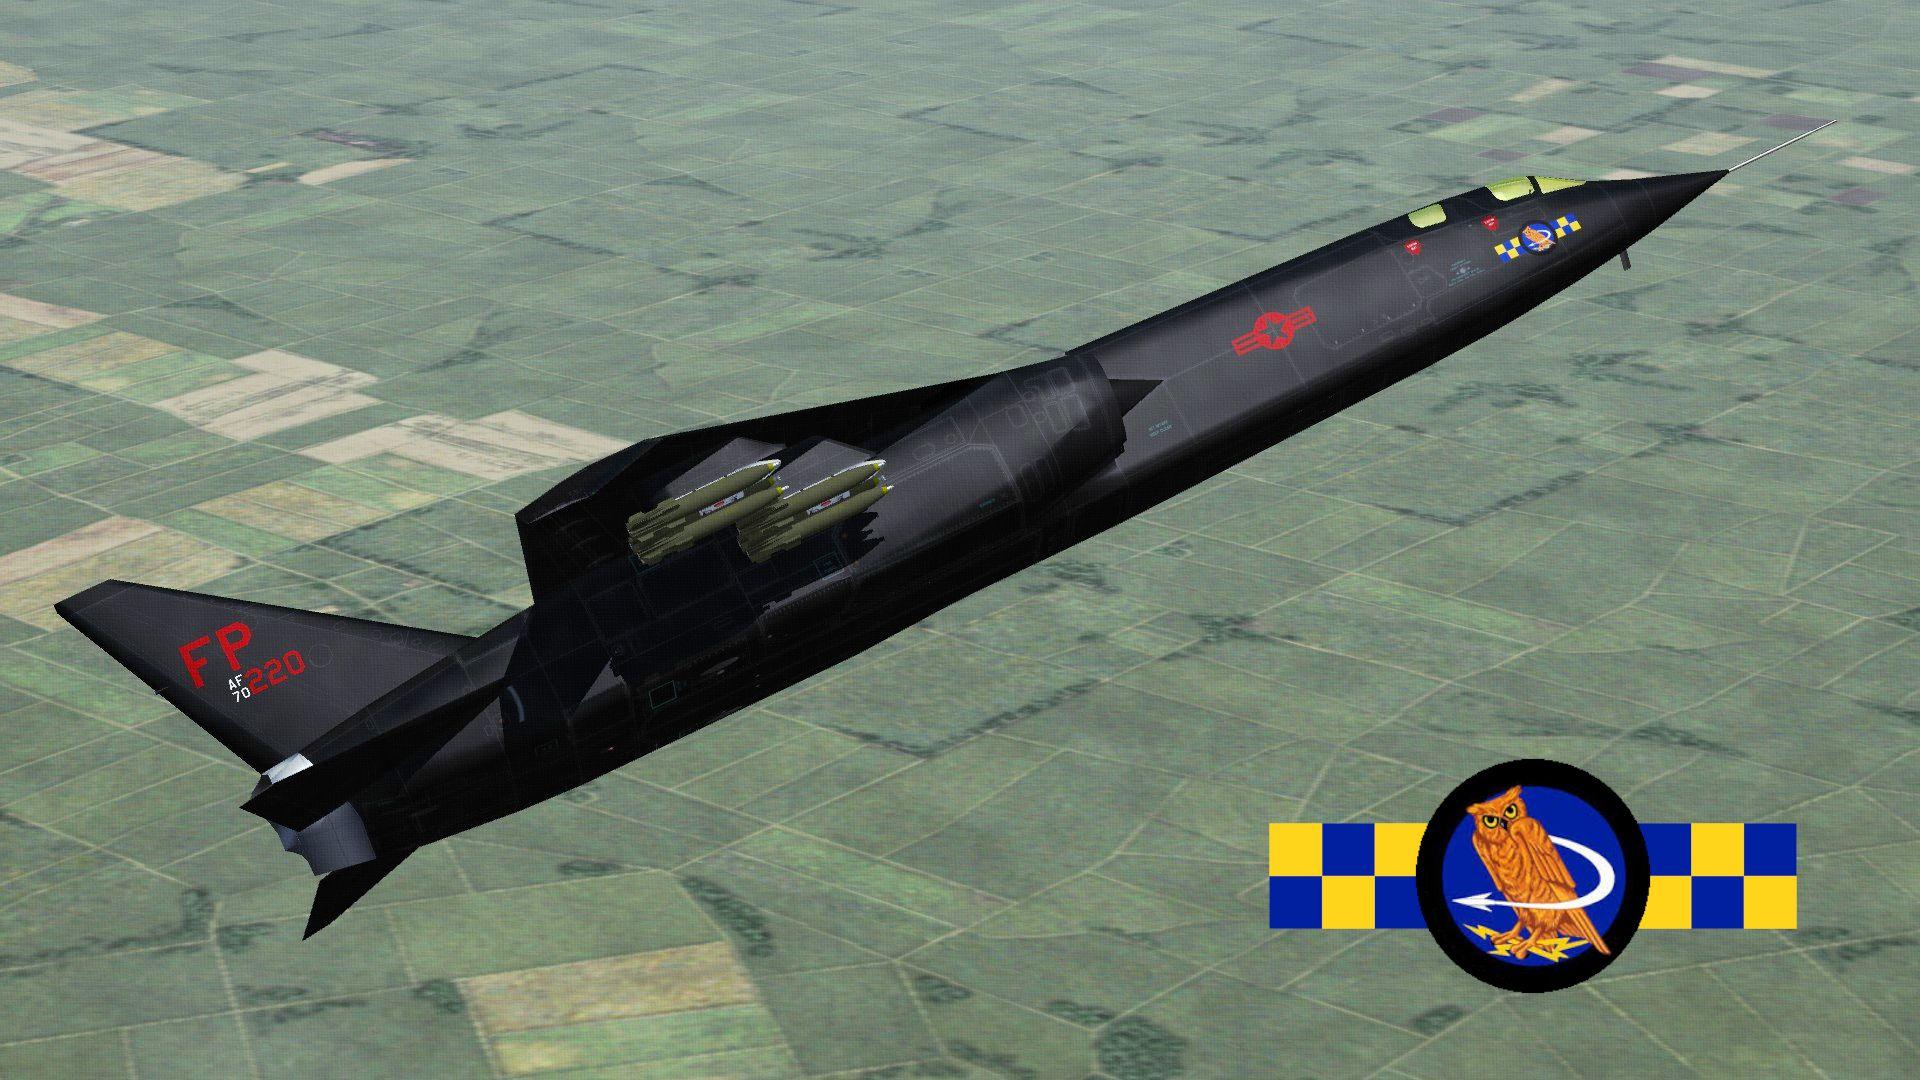 USAF%20TSR2.06_zpszpigdbwk.jpg